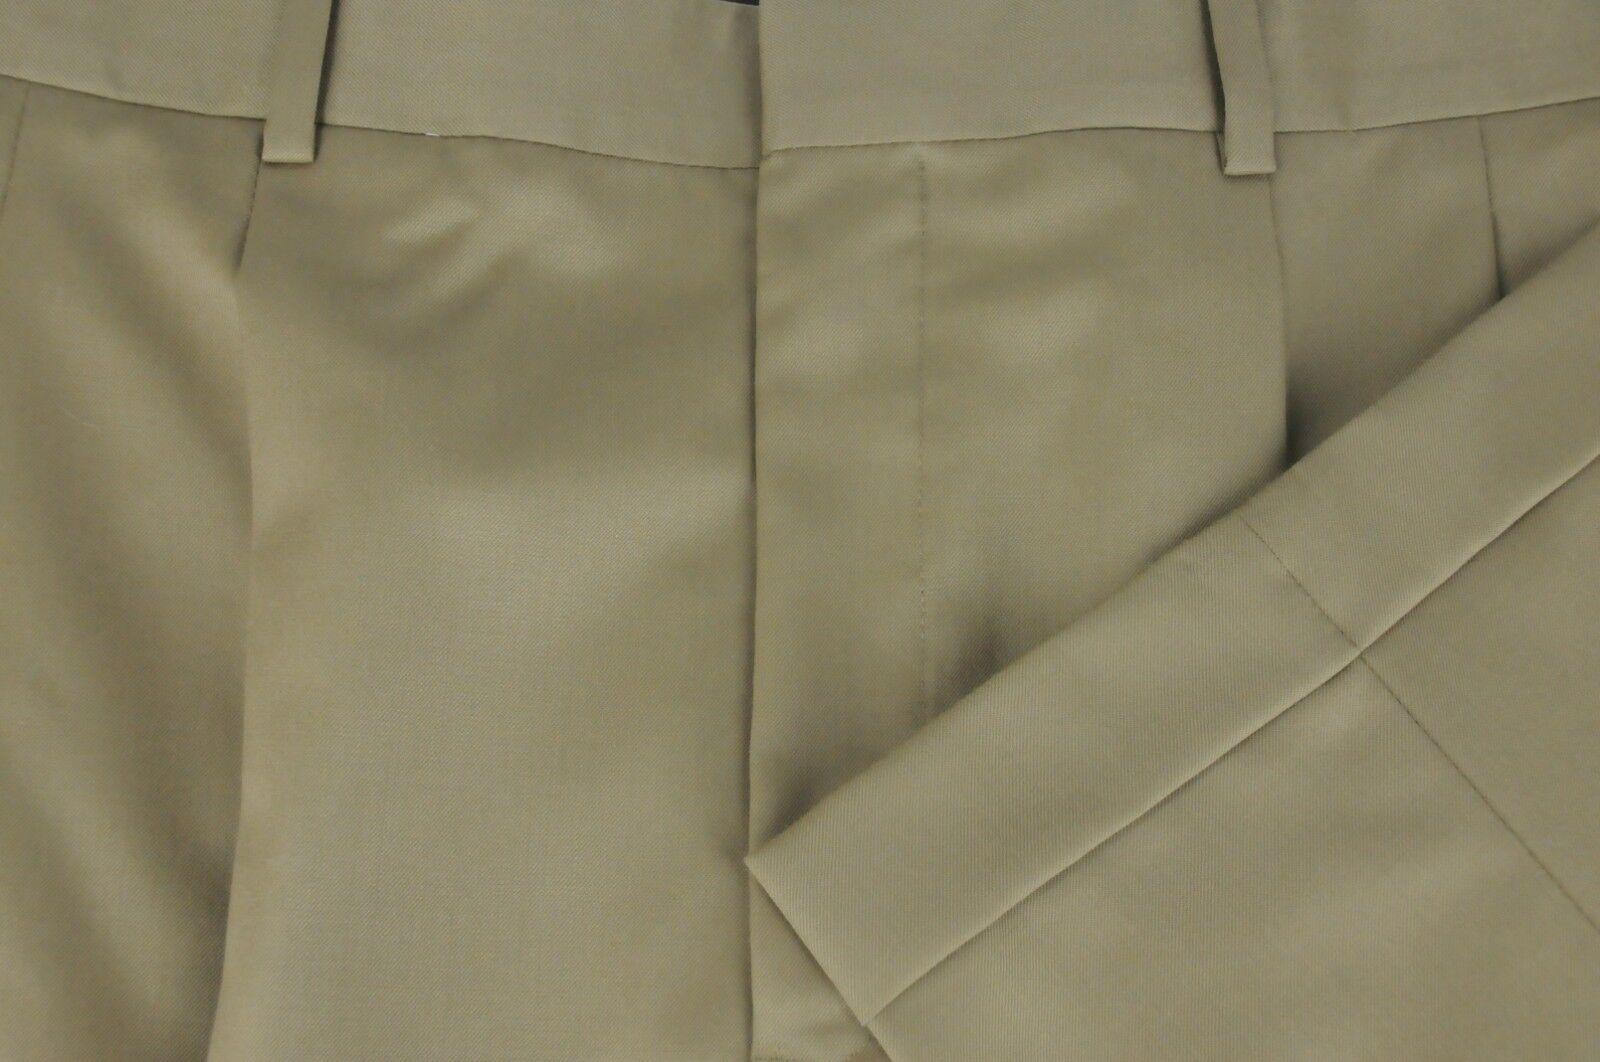 Corbin Men's Tan Wool Pleated Dress Pants 35 x 30